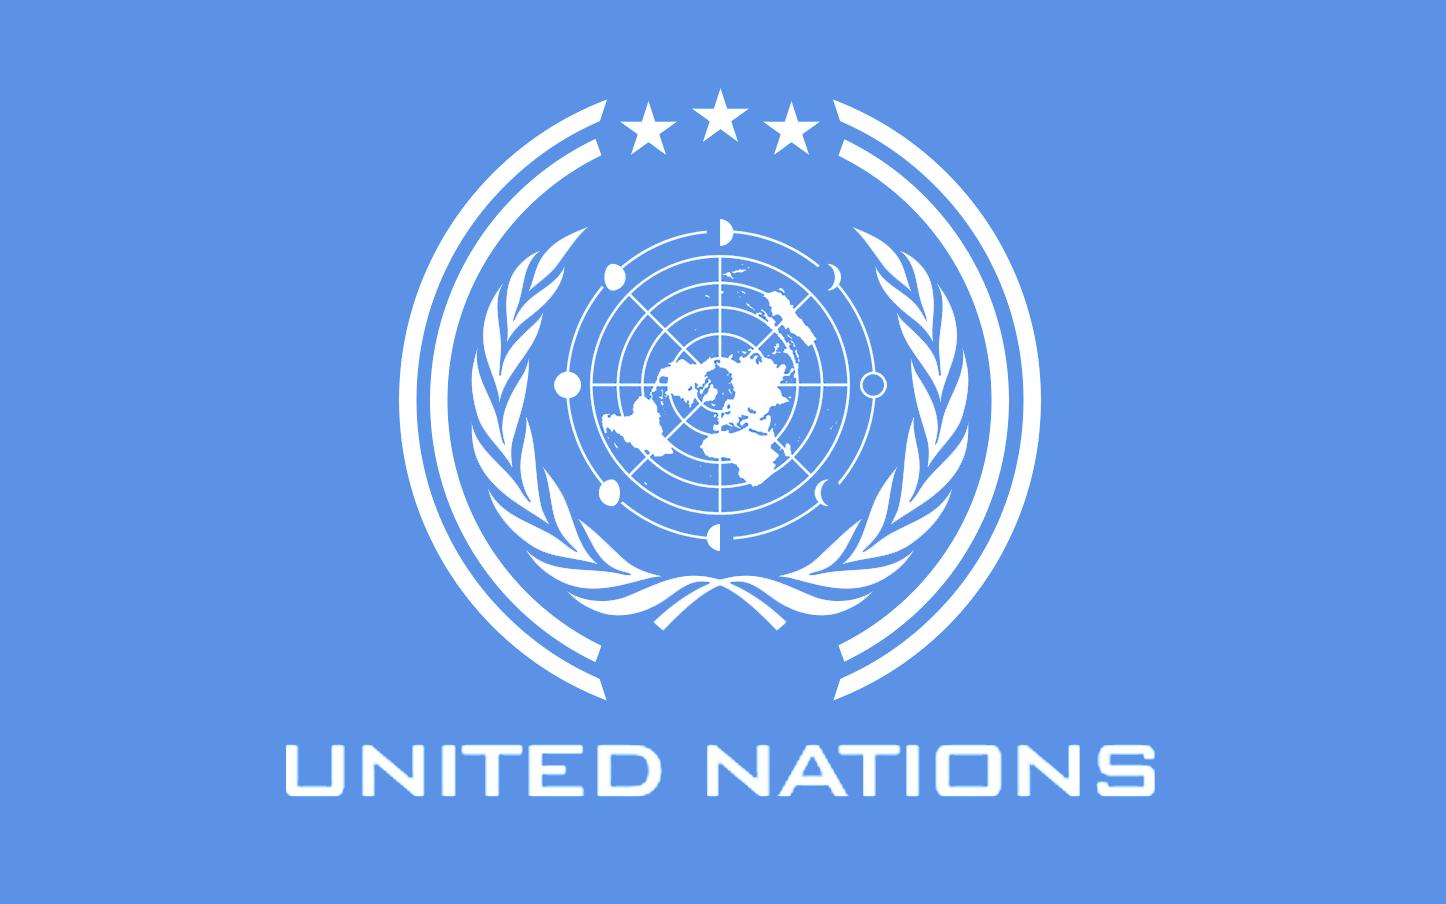 FinMin Joint Secretary Rashmi R Das appointed to UN Tax Committee  ധനകാര്യ മന്ത്രാലയത്തിലെ ജോയിന്റ് സെക്രട്ടറി രശ്മി ആർ ദാസിനെ UN ടാക്സ് കമ്മിറ്റിയിലേക്ക് നിയമിച്ചു_40.1